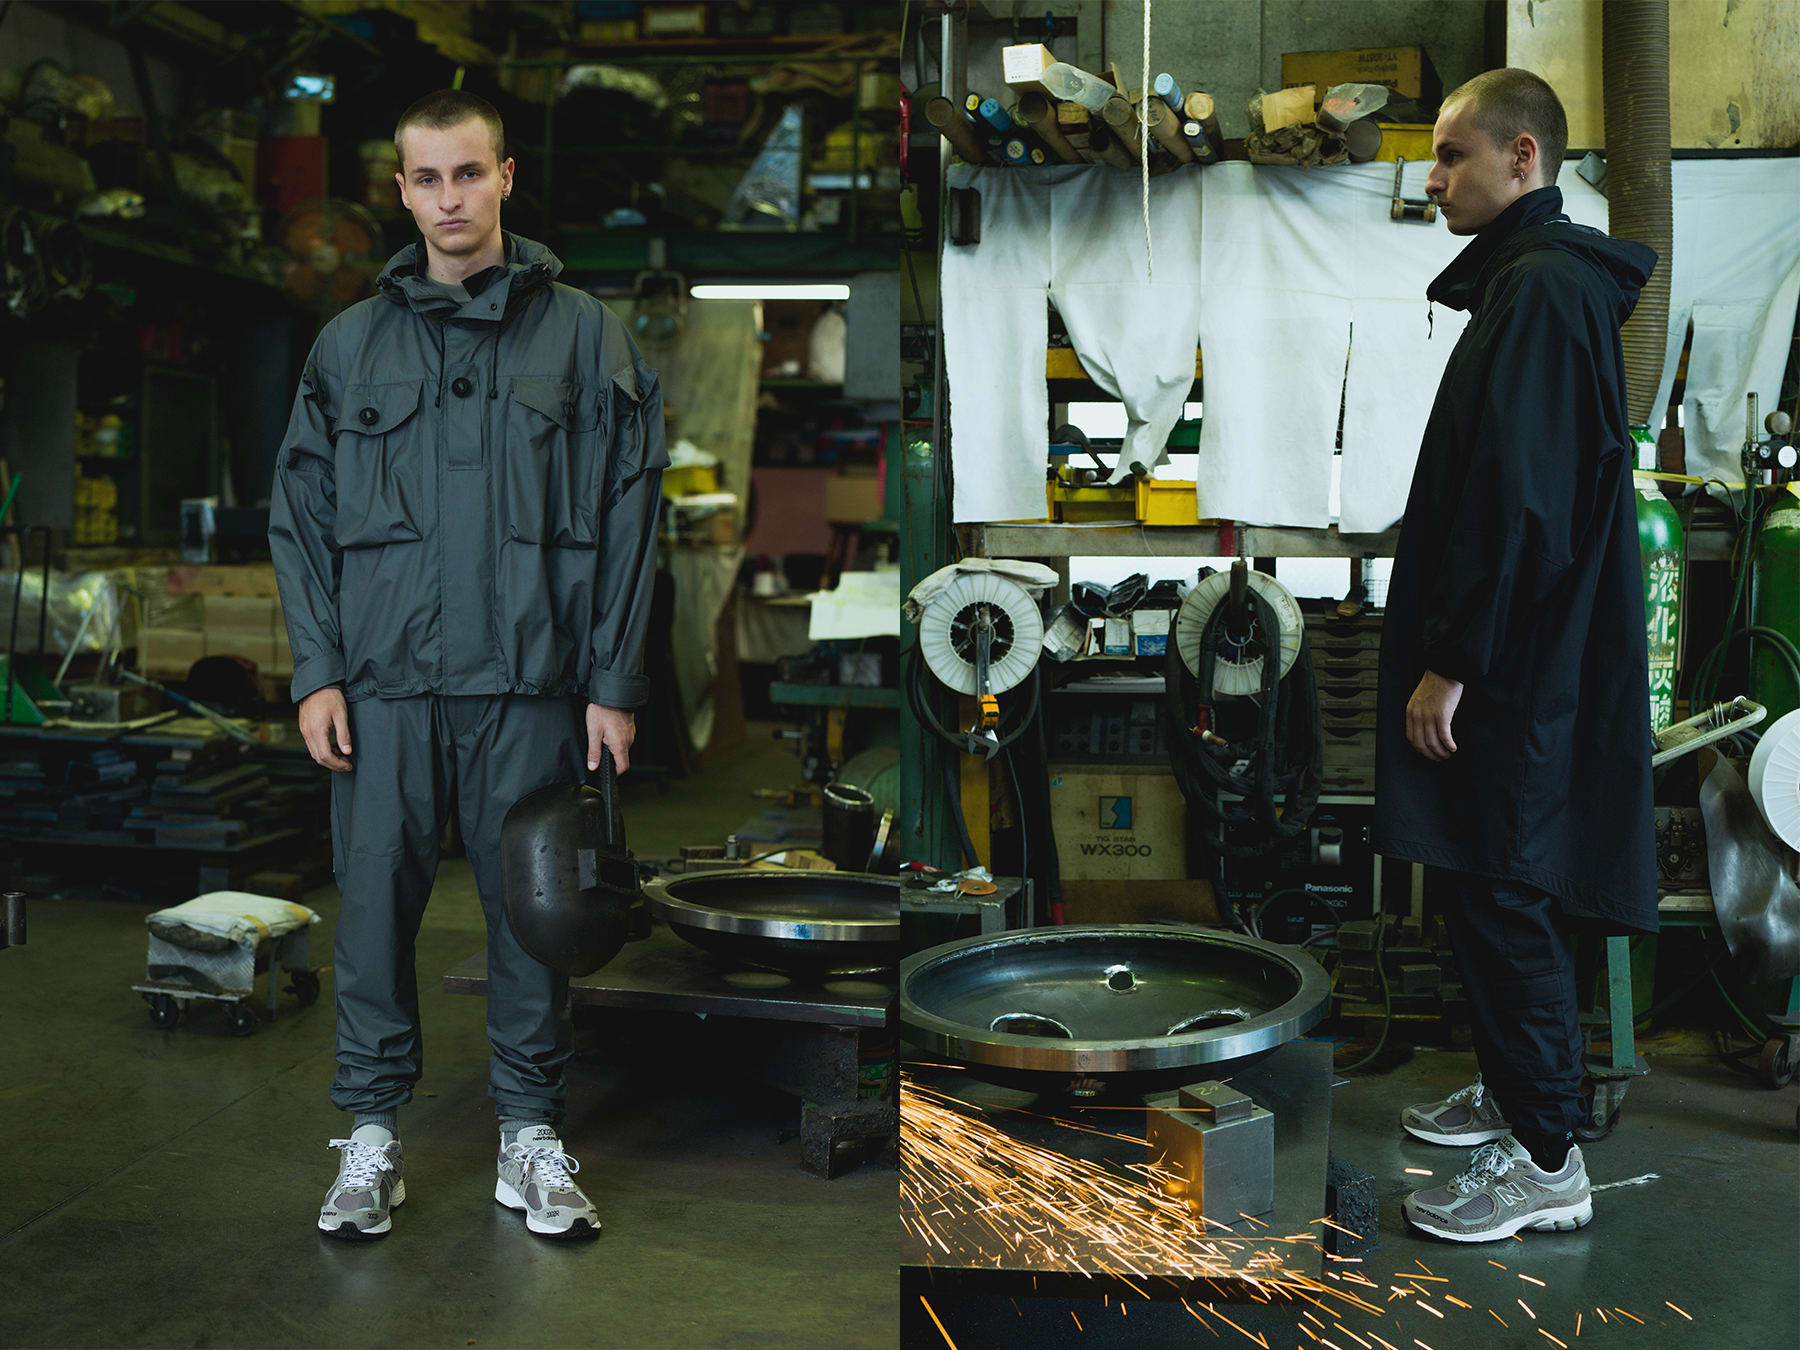 Invincible x N.Hoolywood x New Balance 2002R Collab